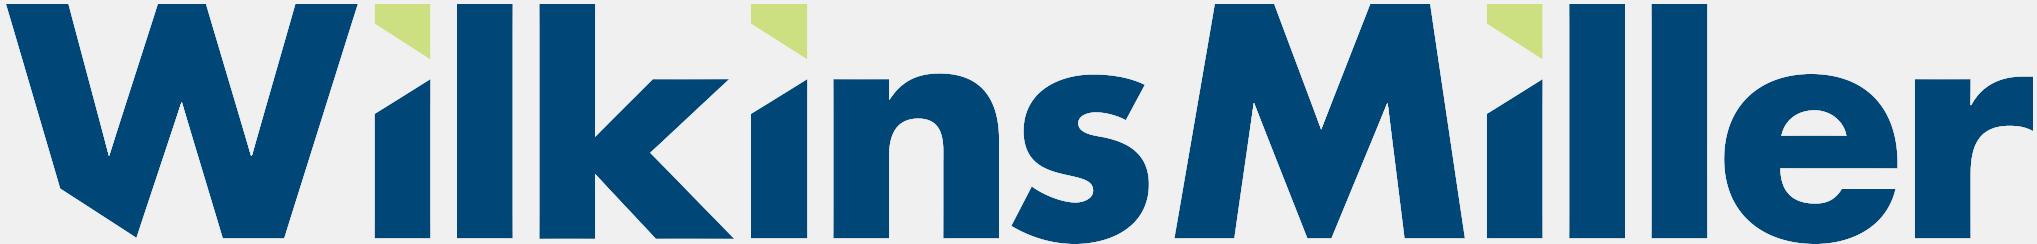 Large transparent WilkinsMiller text image